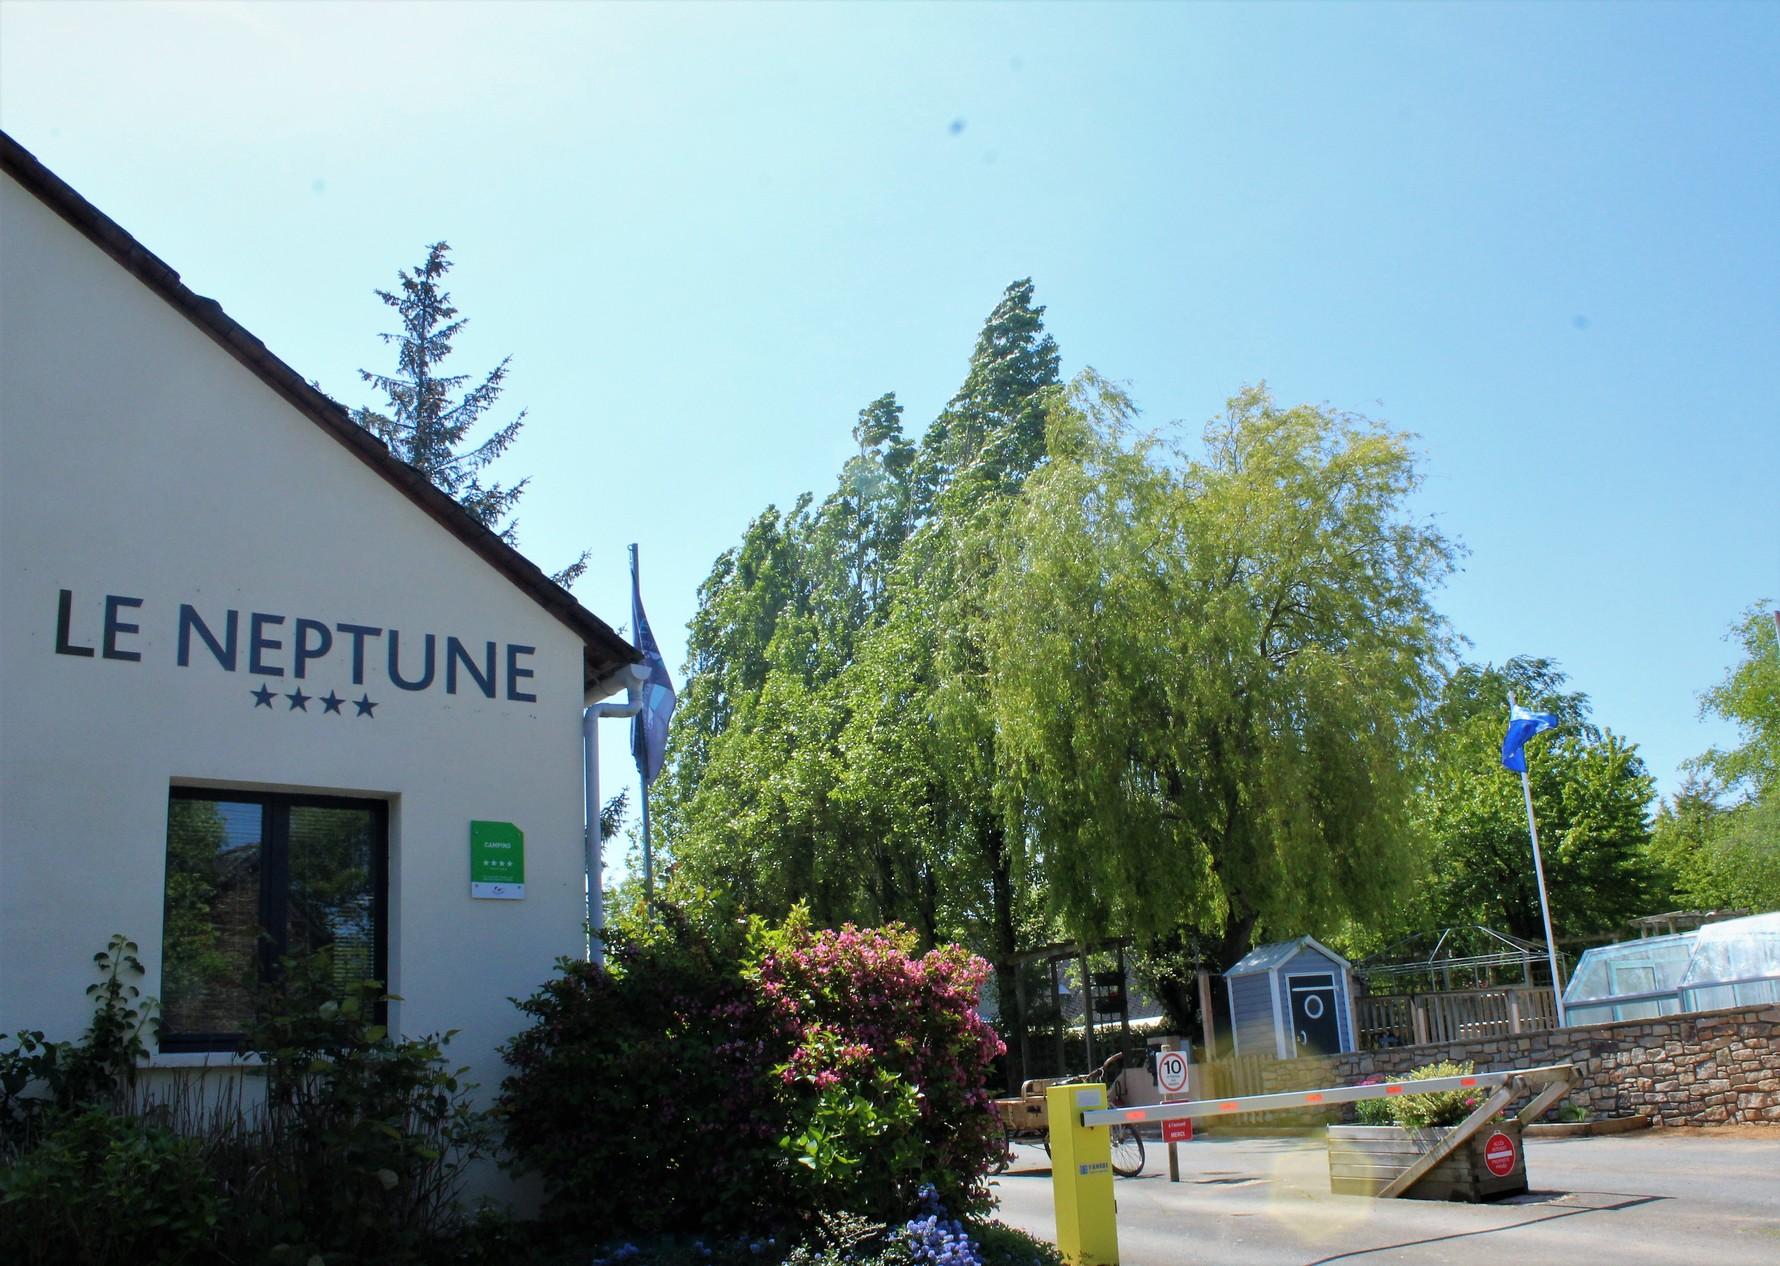 Frankrijk-Lanloup-Camping%20Le%20Neptune-ExtraLarge Wintersport Frankrijk